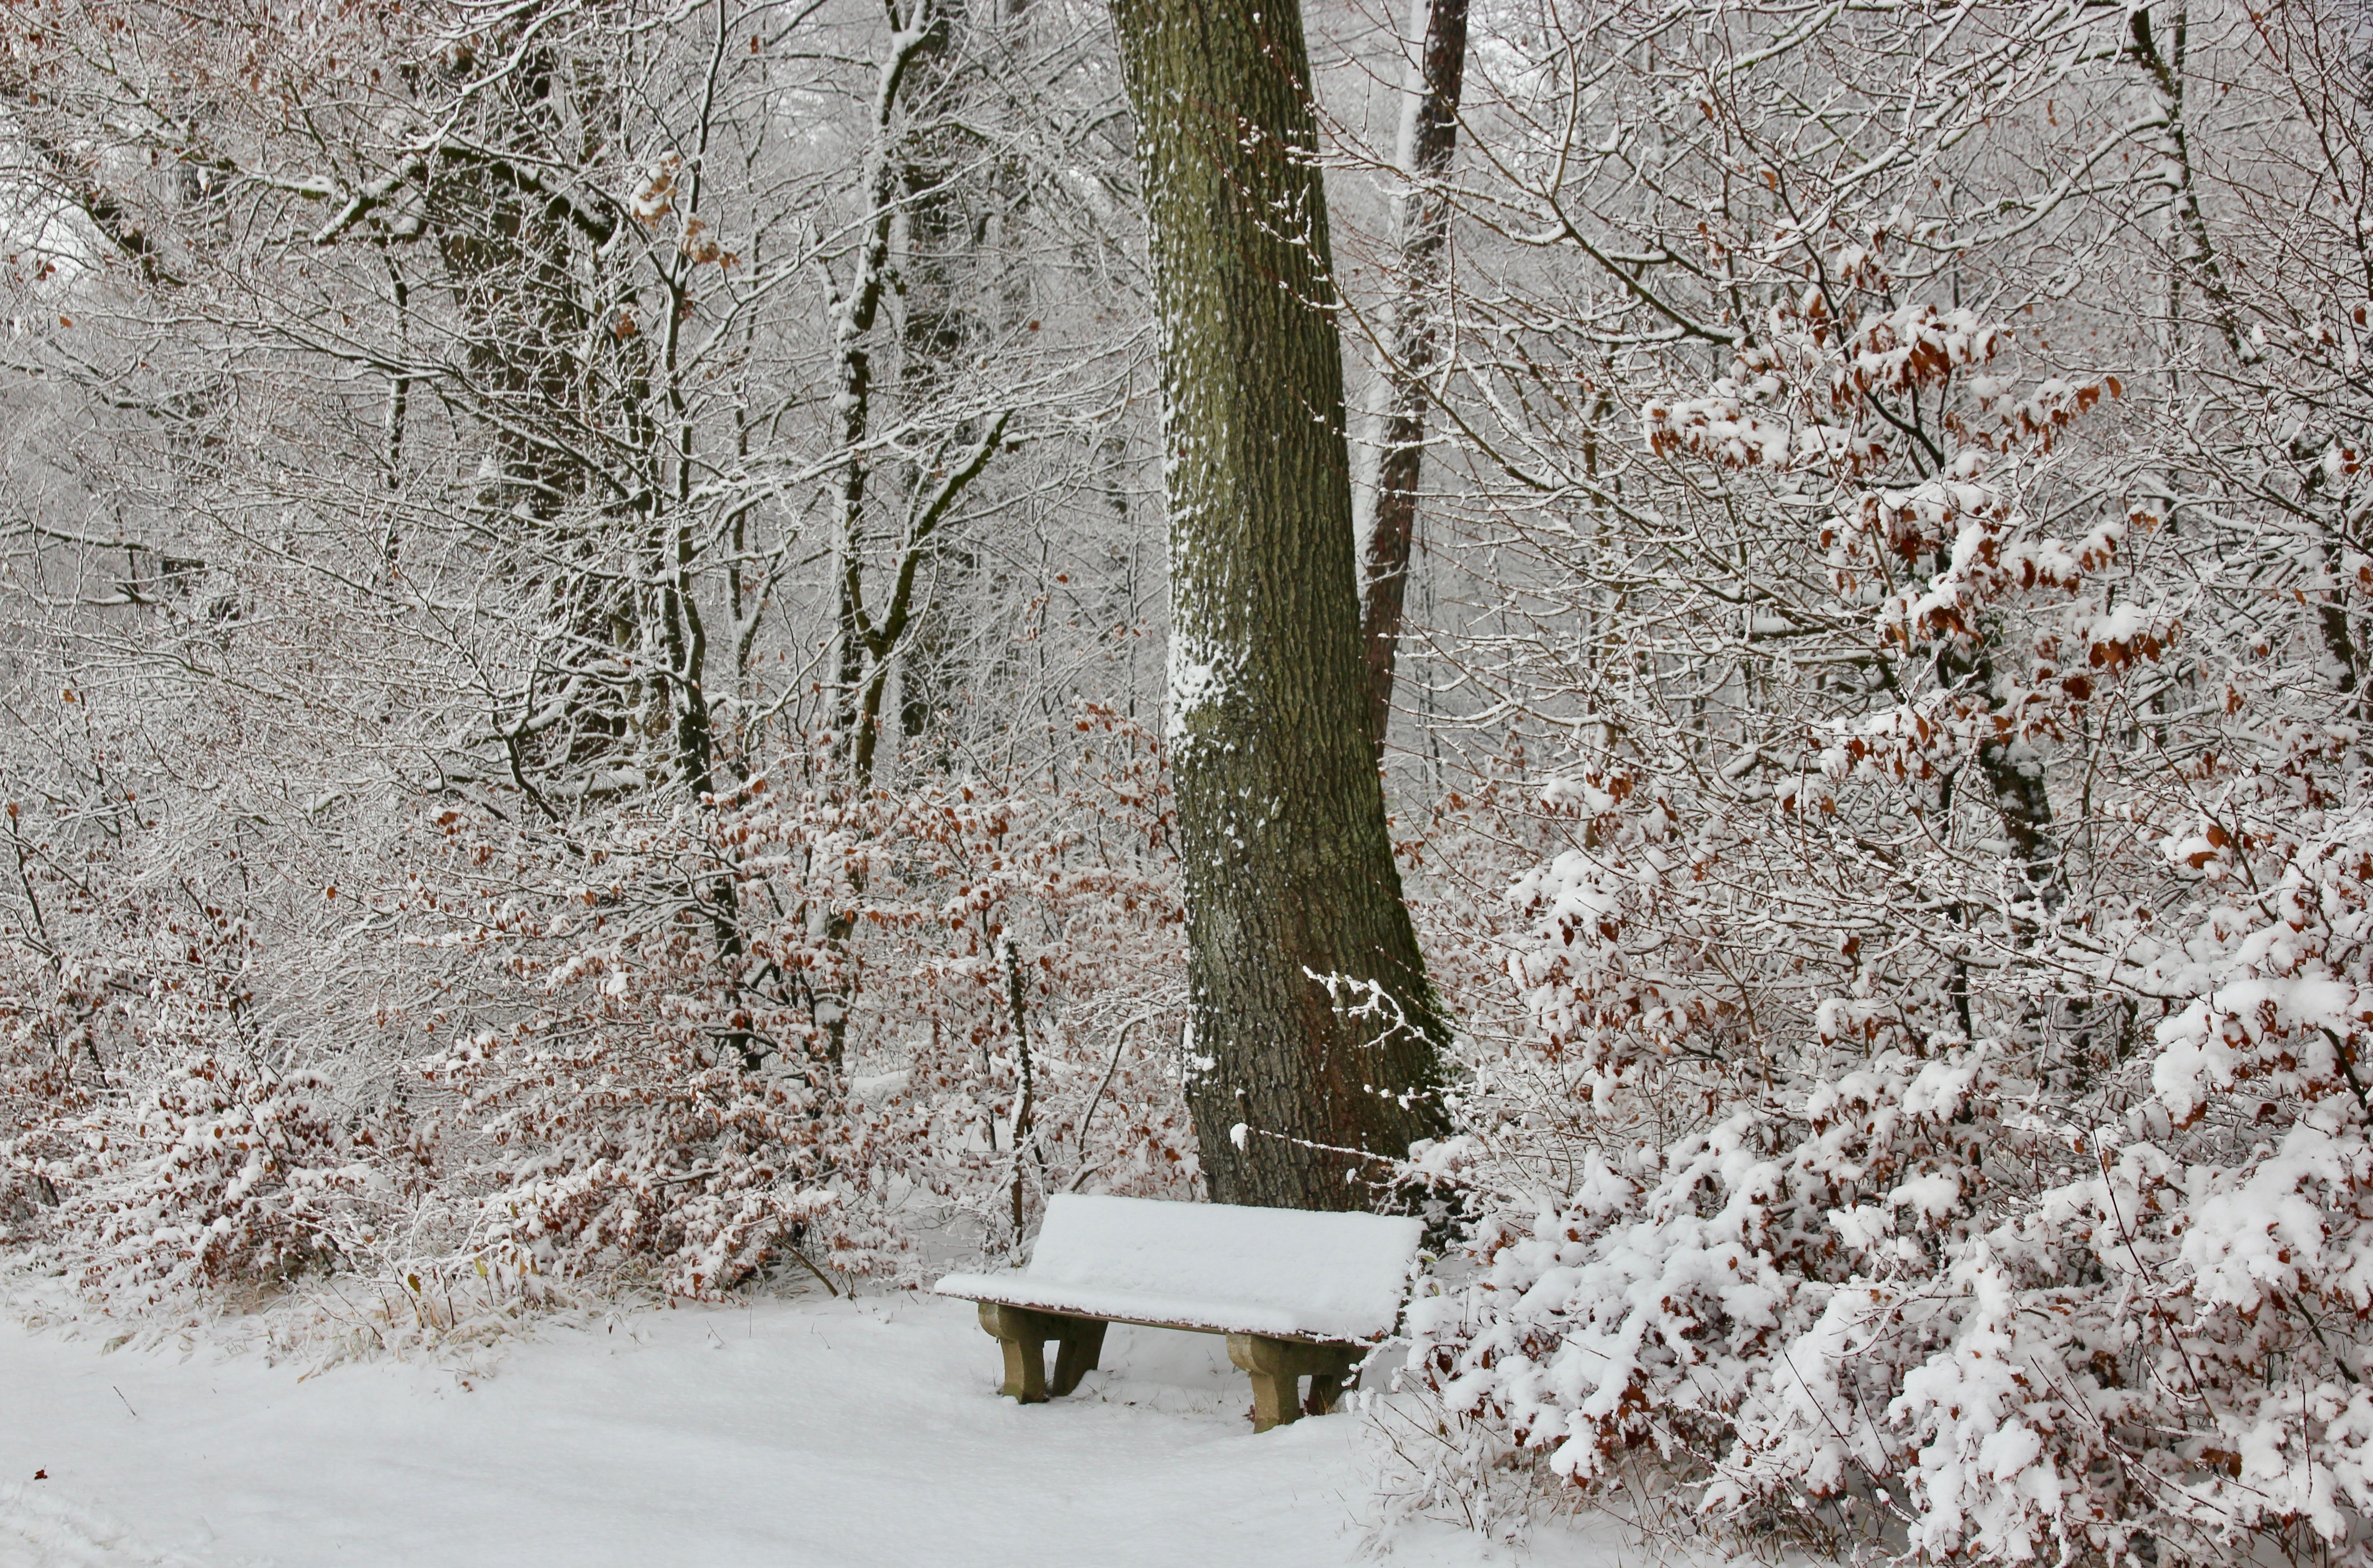 Zurigo con la neve